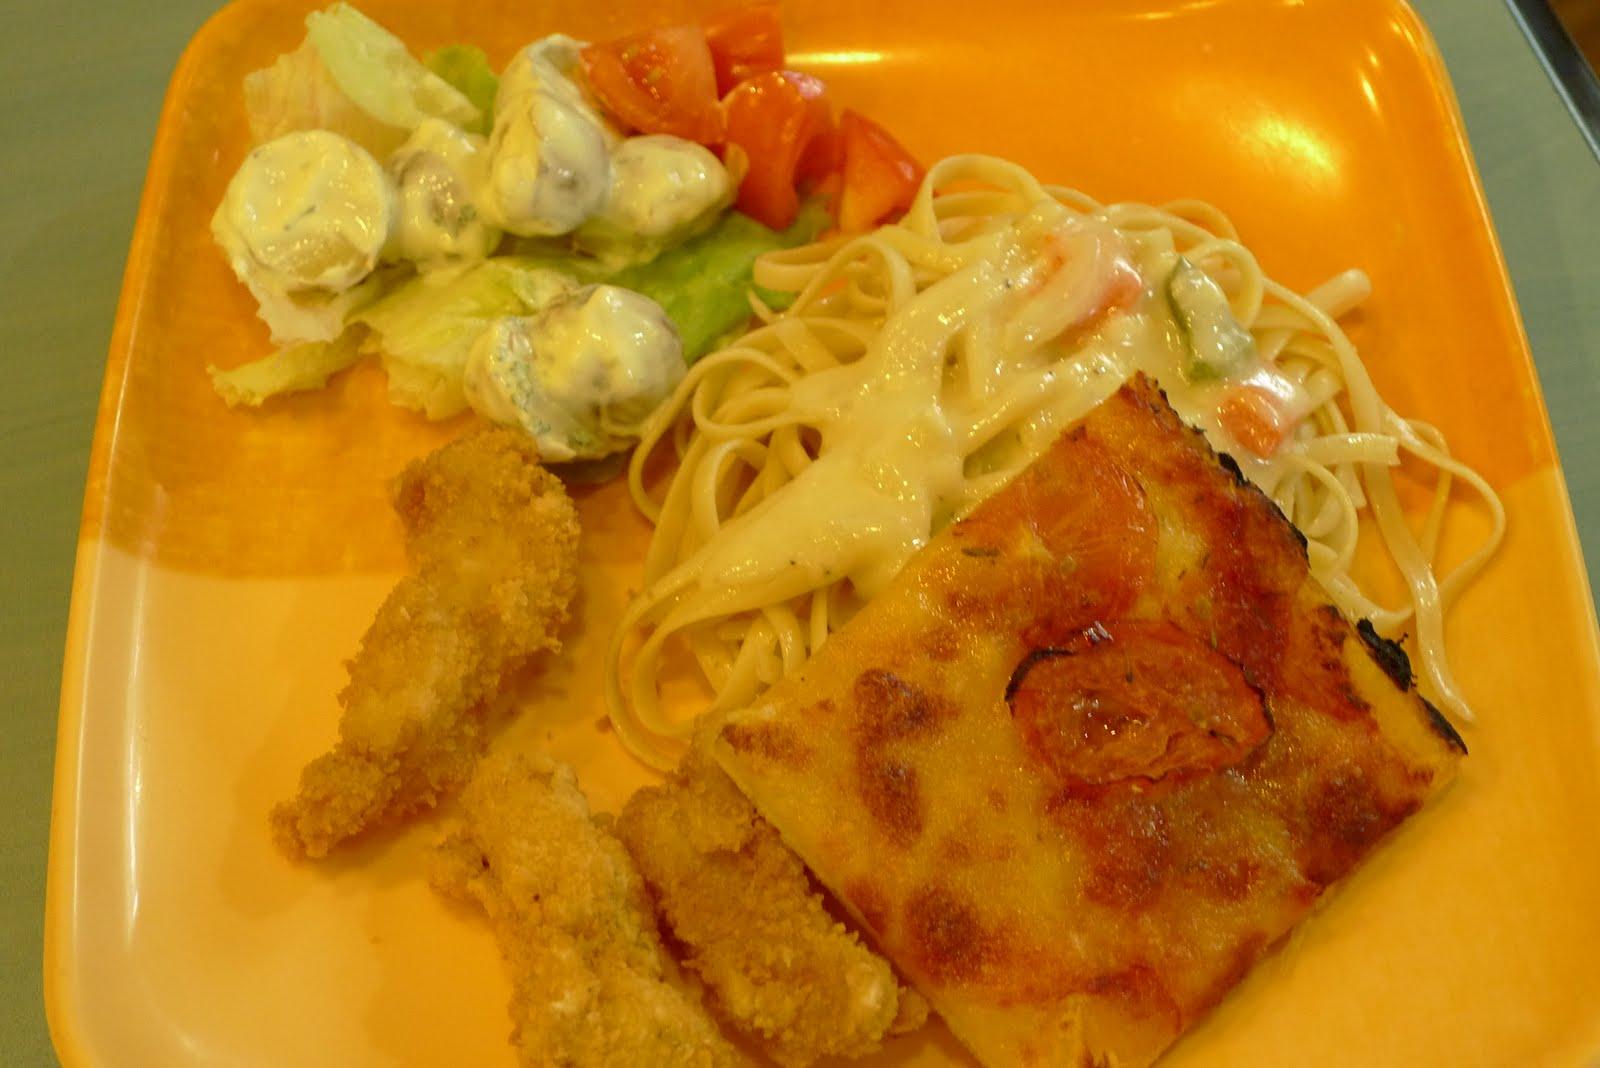 ... potatoes, fettuccine with alfredo sauce, fish fillet, grandma's pizza